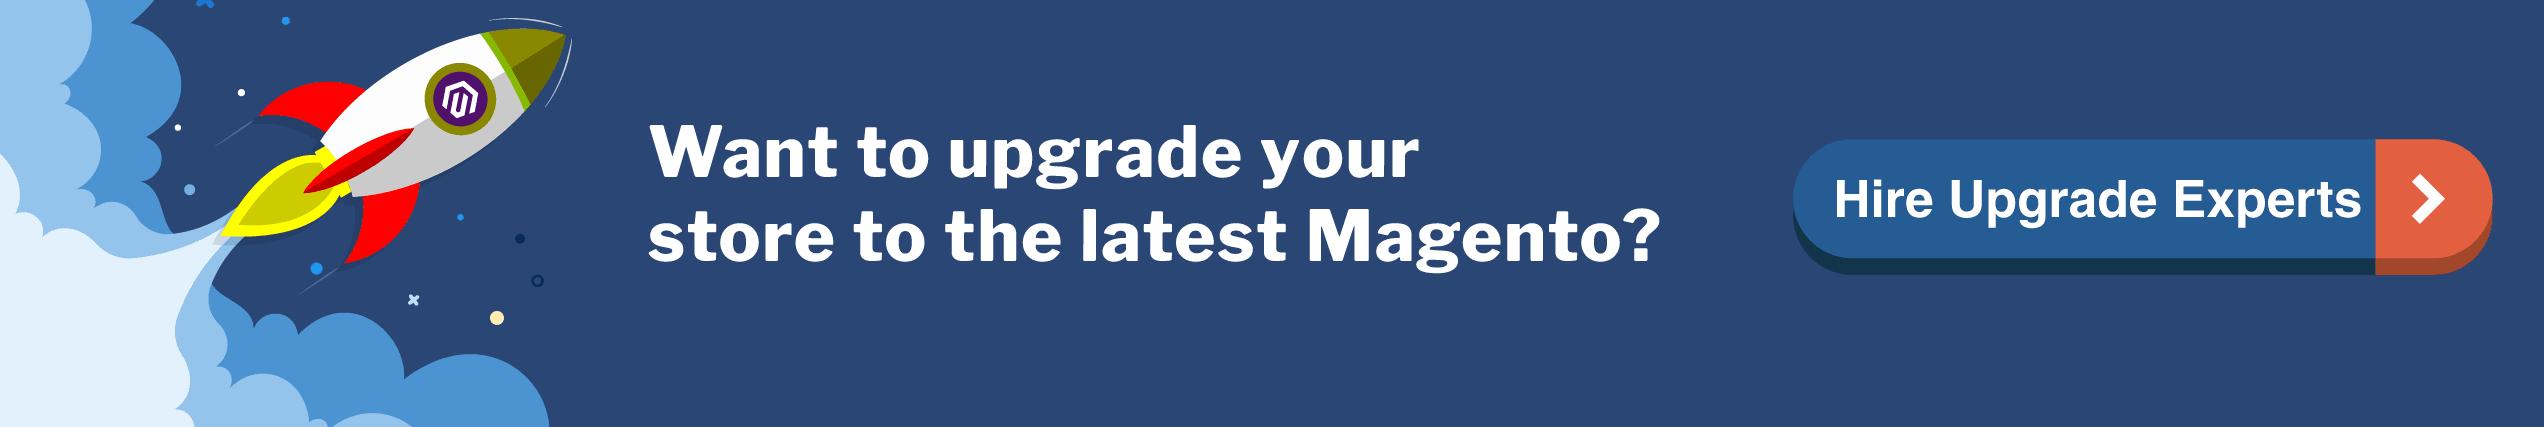 Magento Upgrade Service CTA